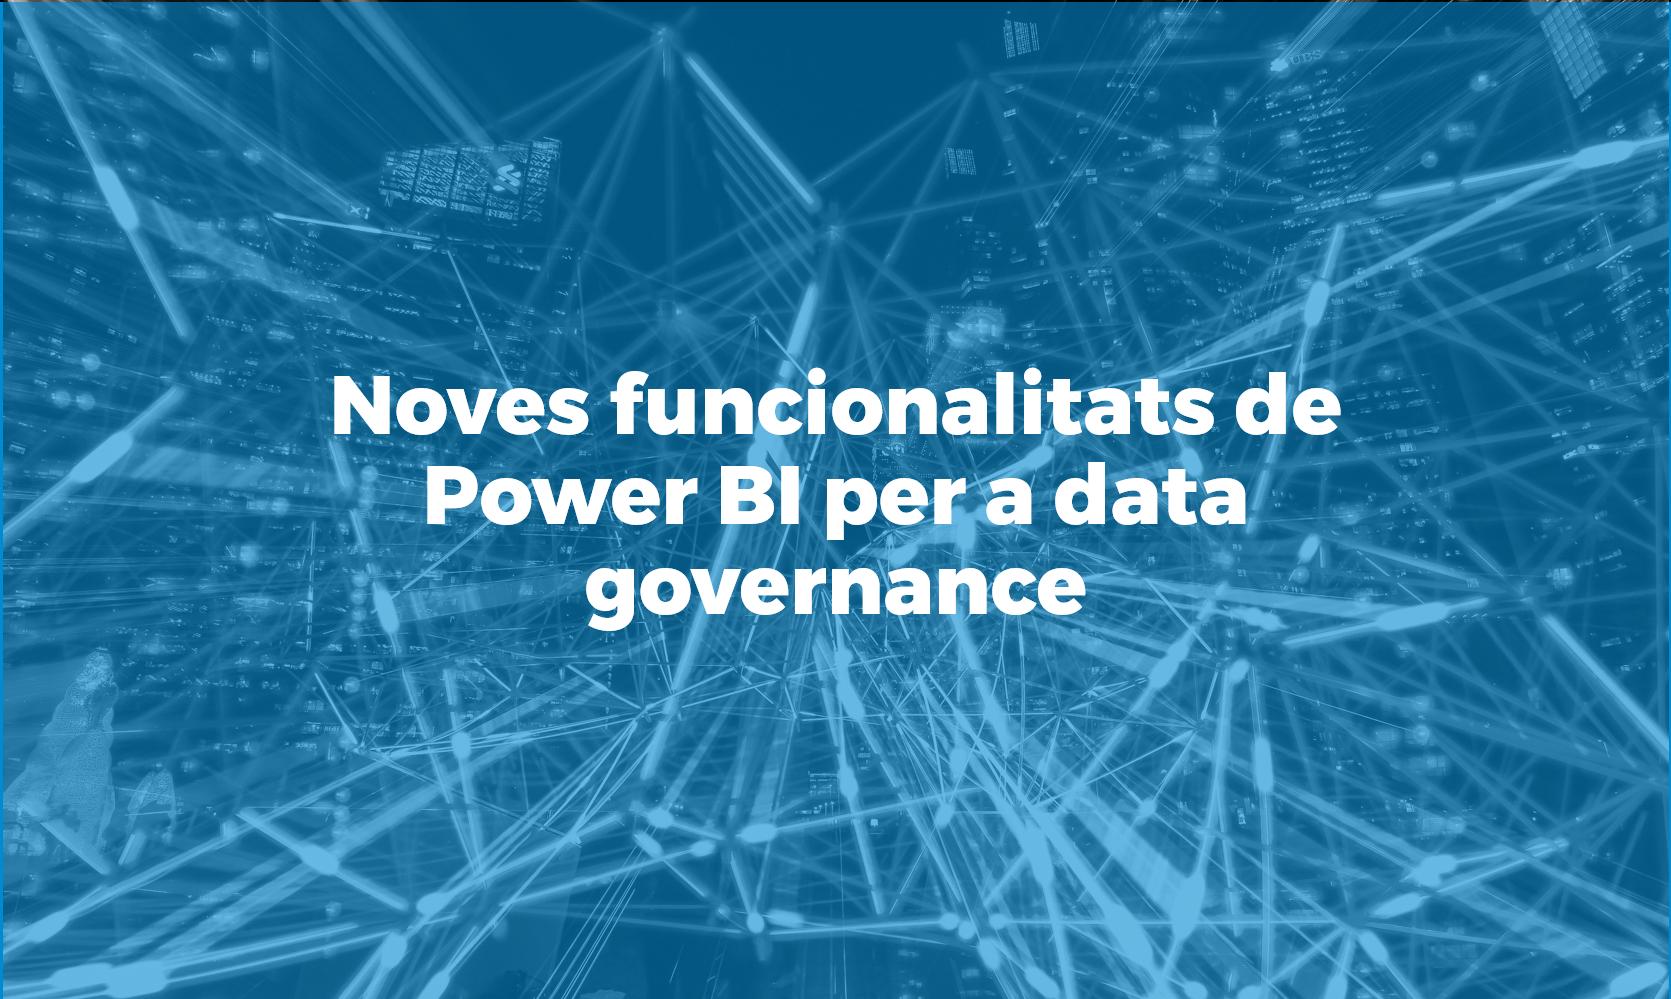 Power BI per a data governance